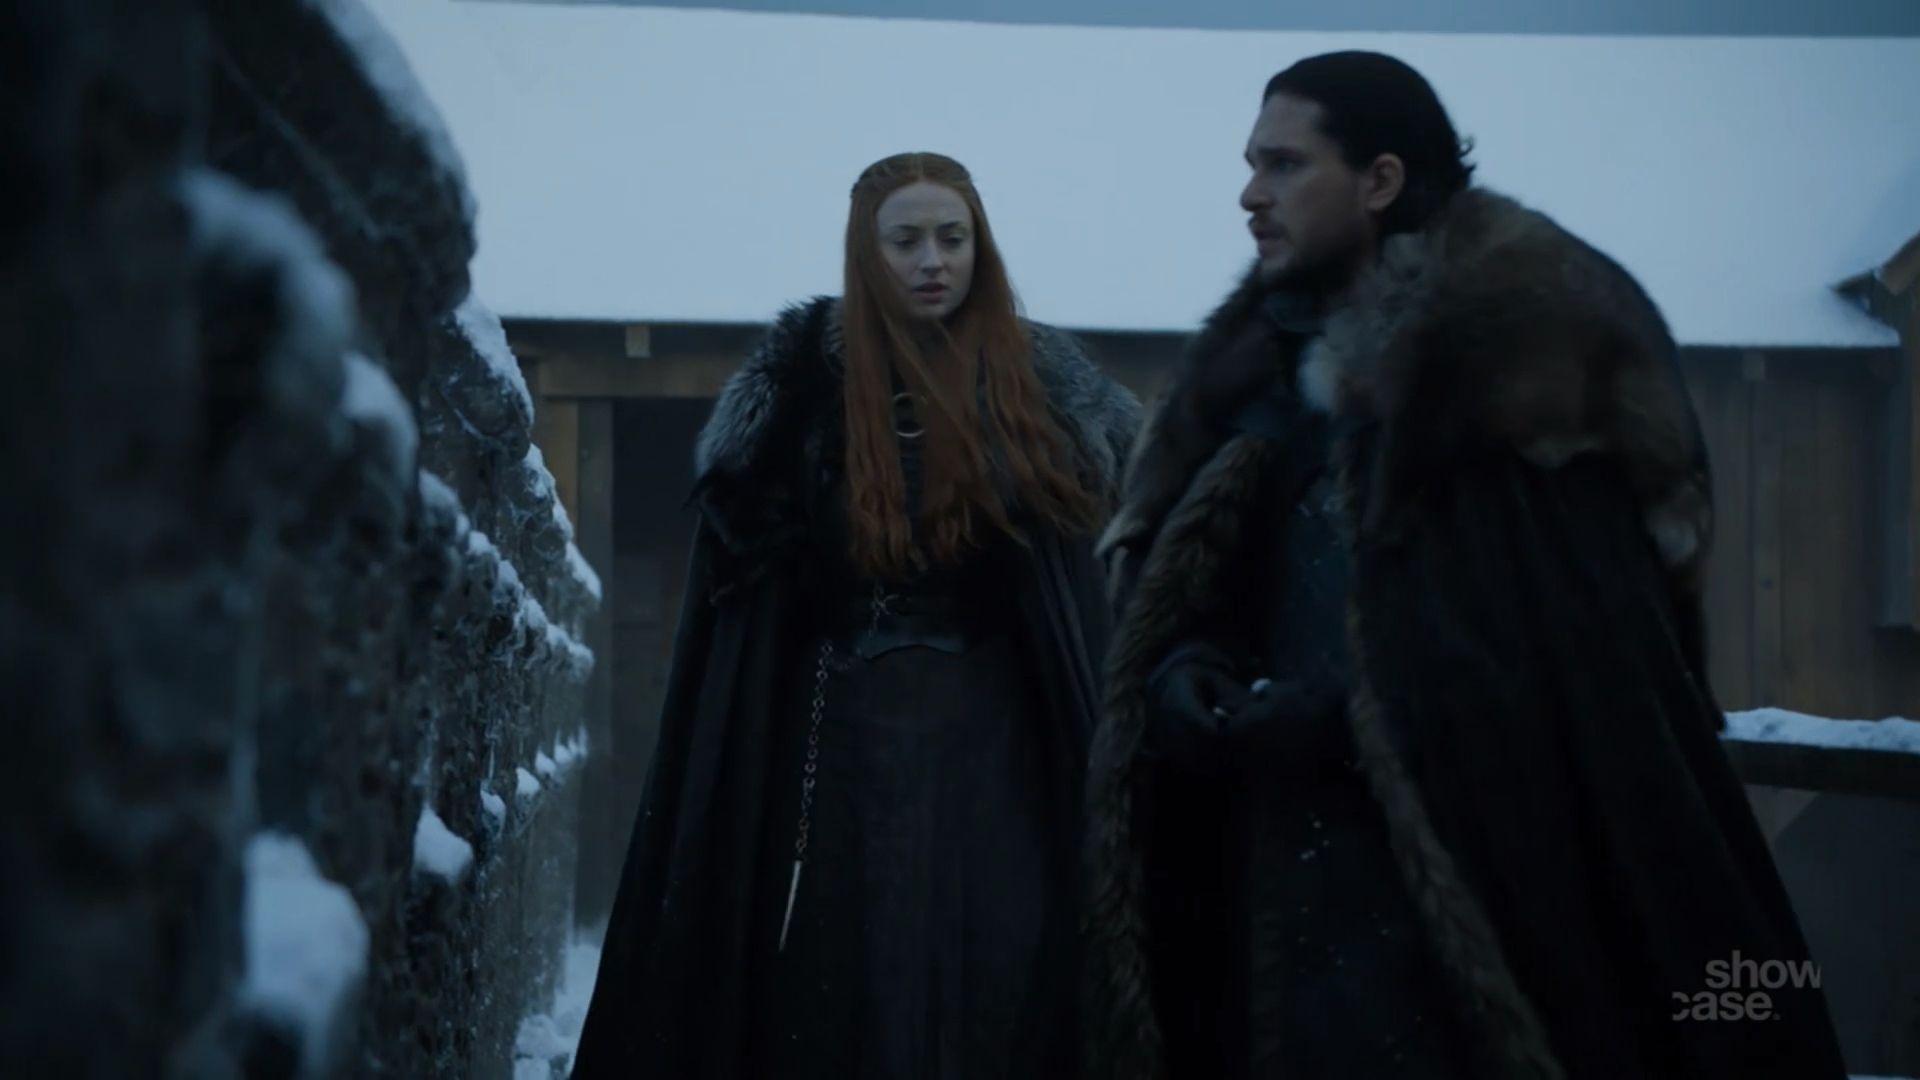 Jon Snow Sansa Stark 7x1 Dragonstone Jon Snow A Dance With Dragons Sansa Stark Starks game of thrones season 7